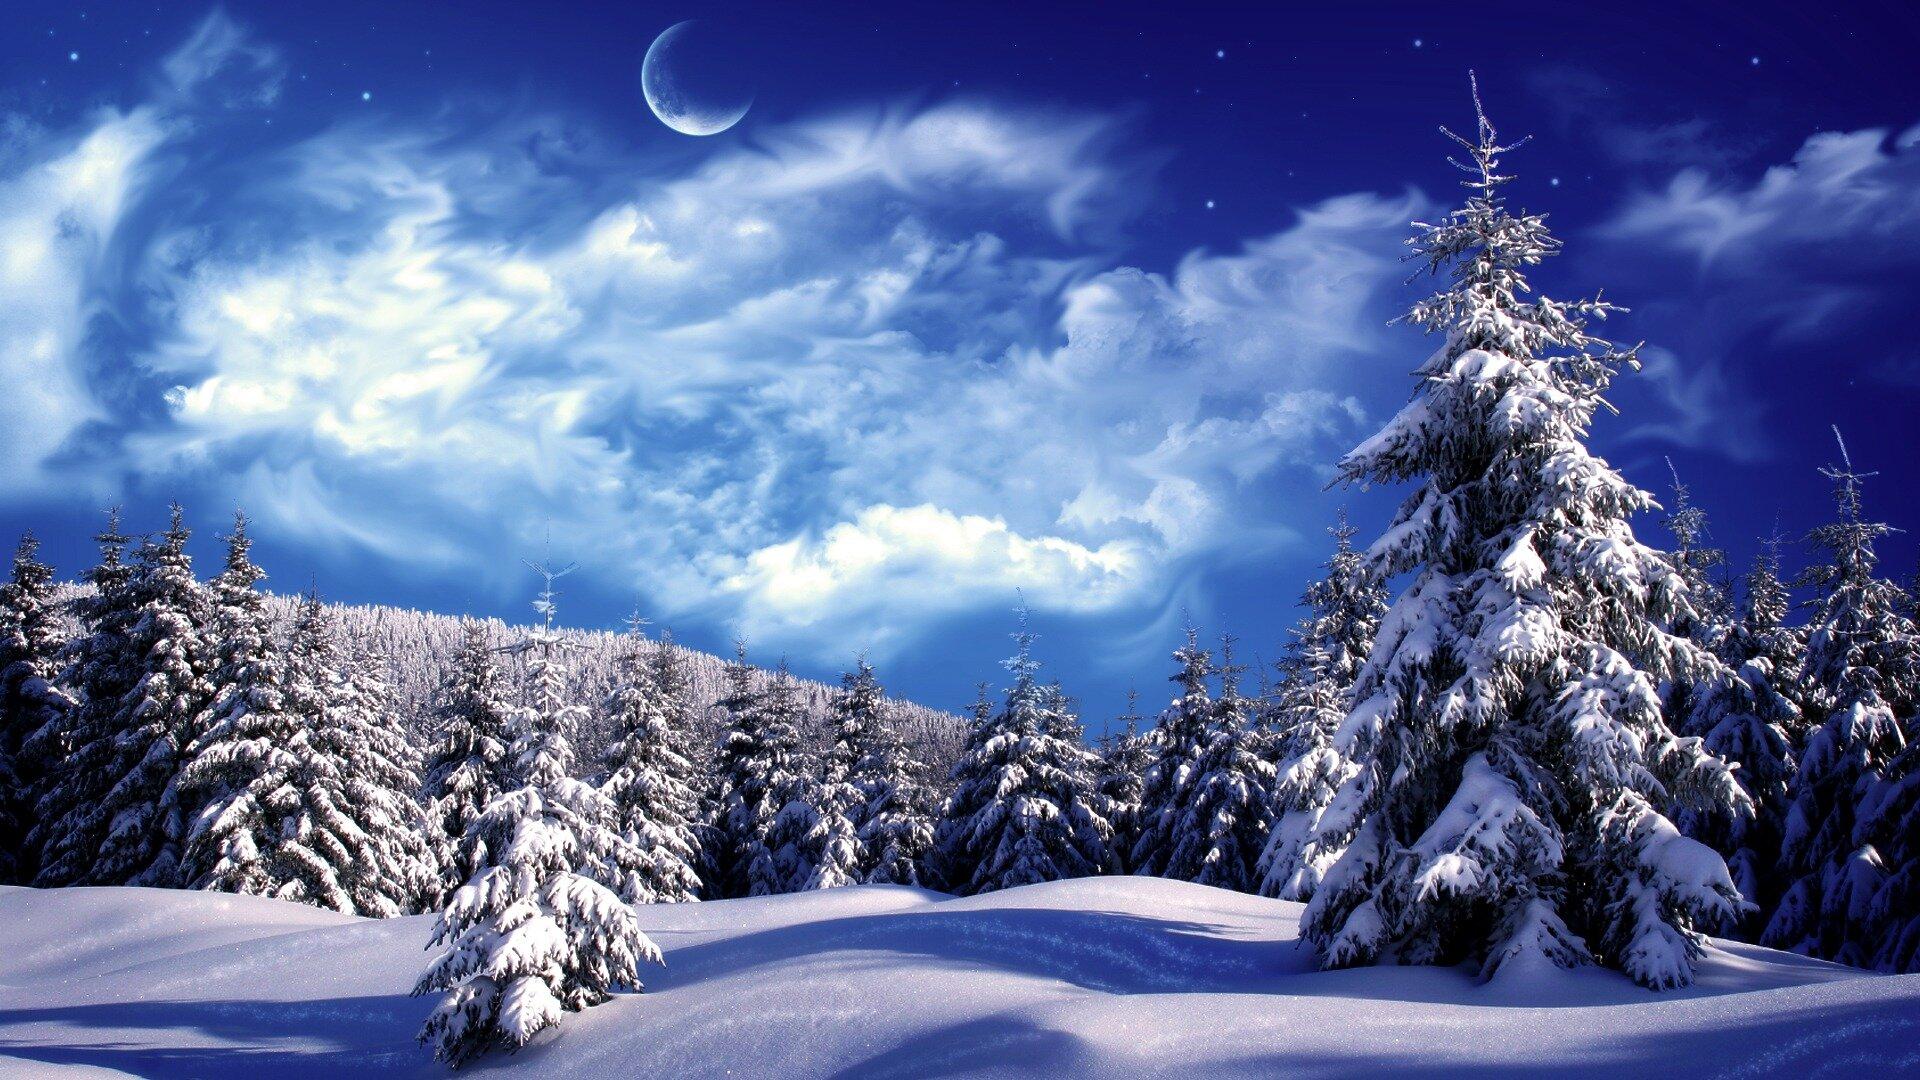 Скачати безплатно фото зими 29 фотография